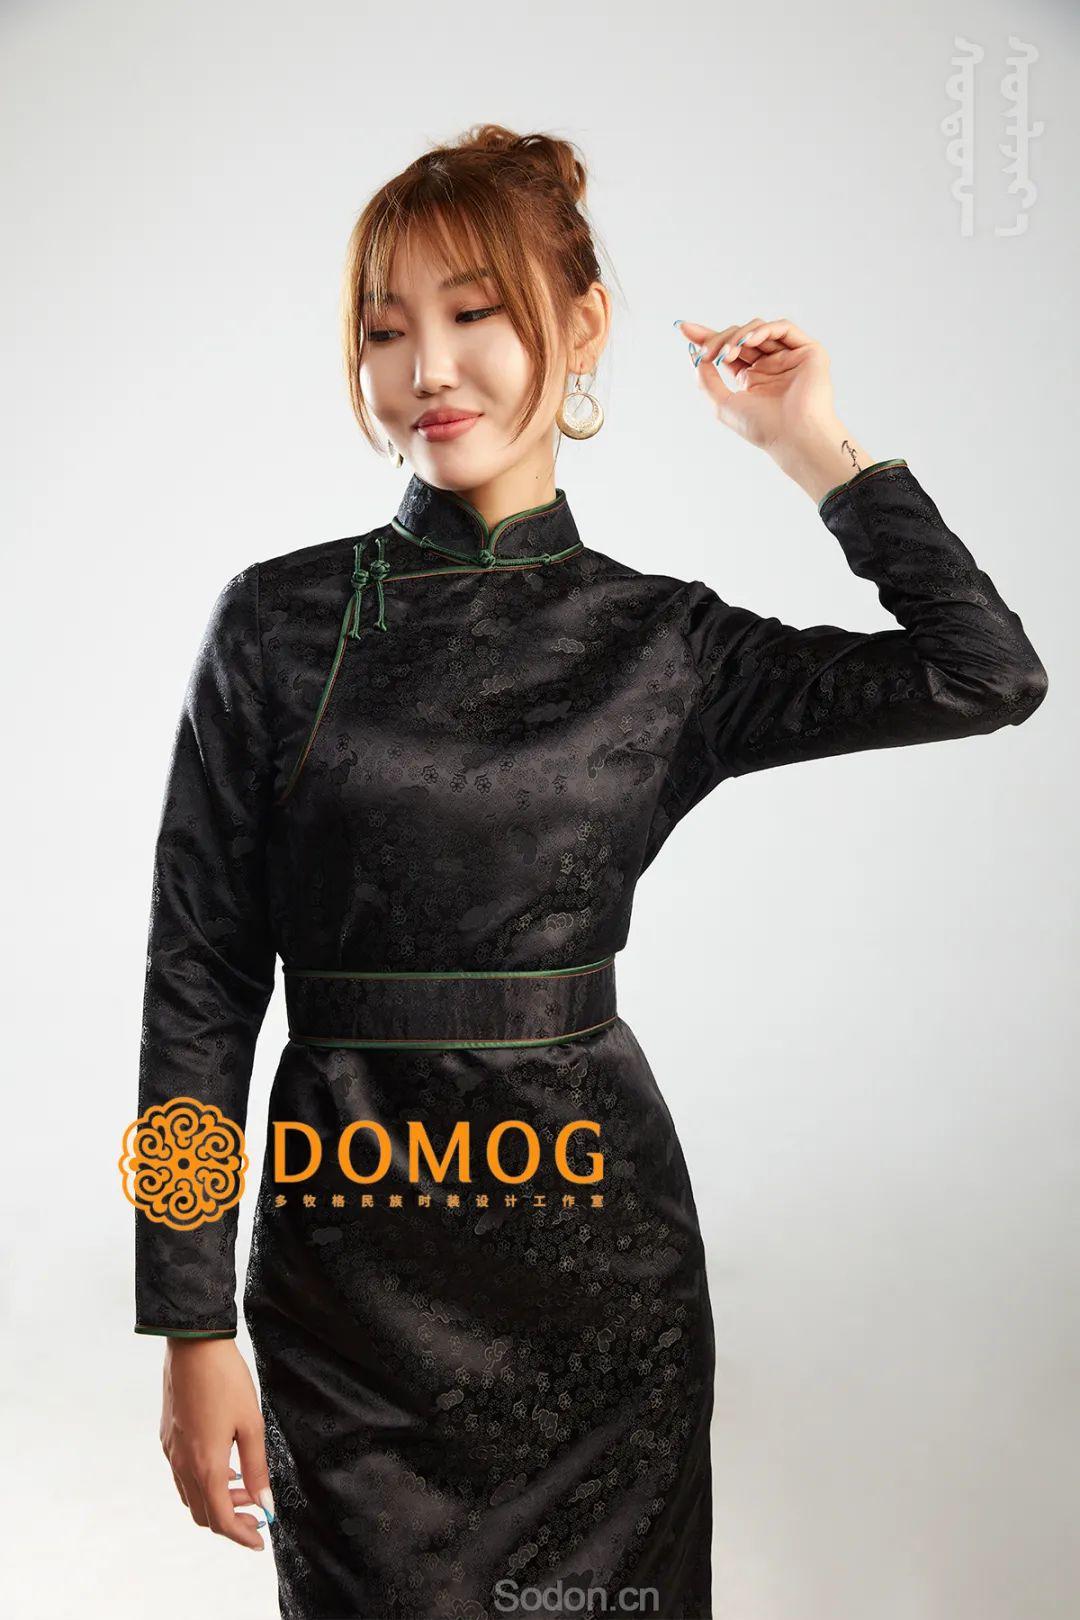 DOMOG 蒙古时装2020新款,民族与时尚的融合 第26张 DOMOG 蒙古时装2020新款,民族与时尚的融合 蒙古服饰